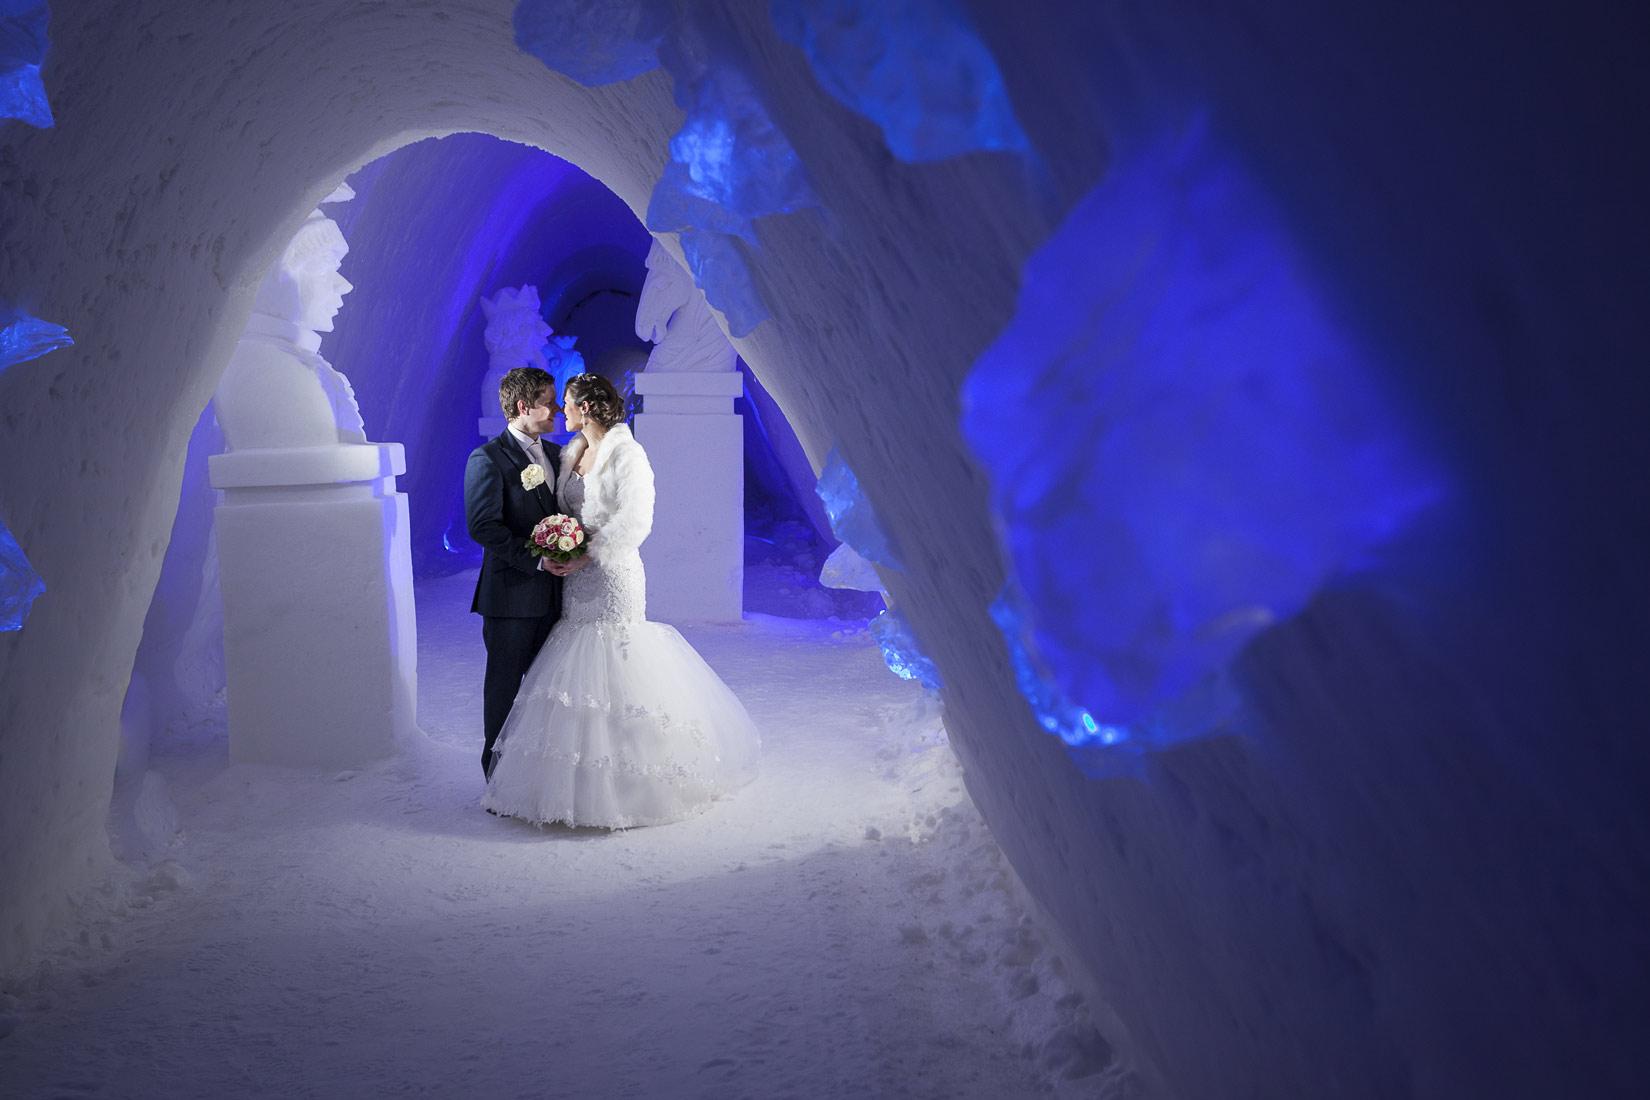 Finland wedding